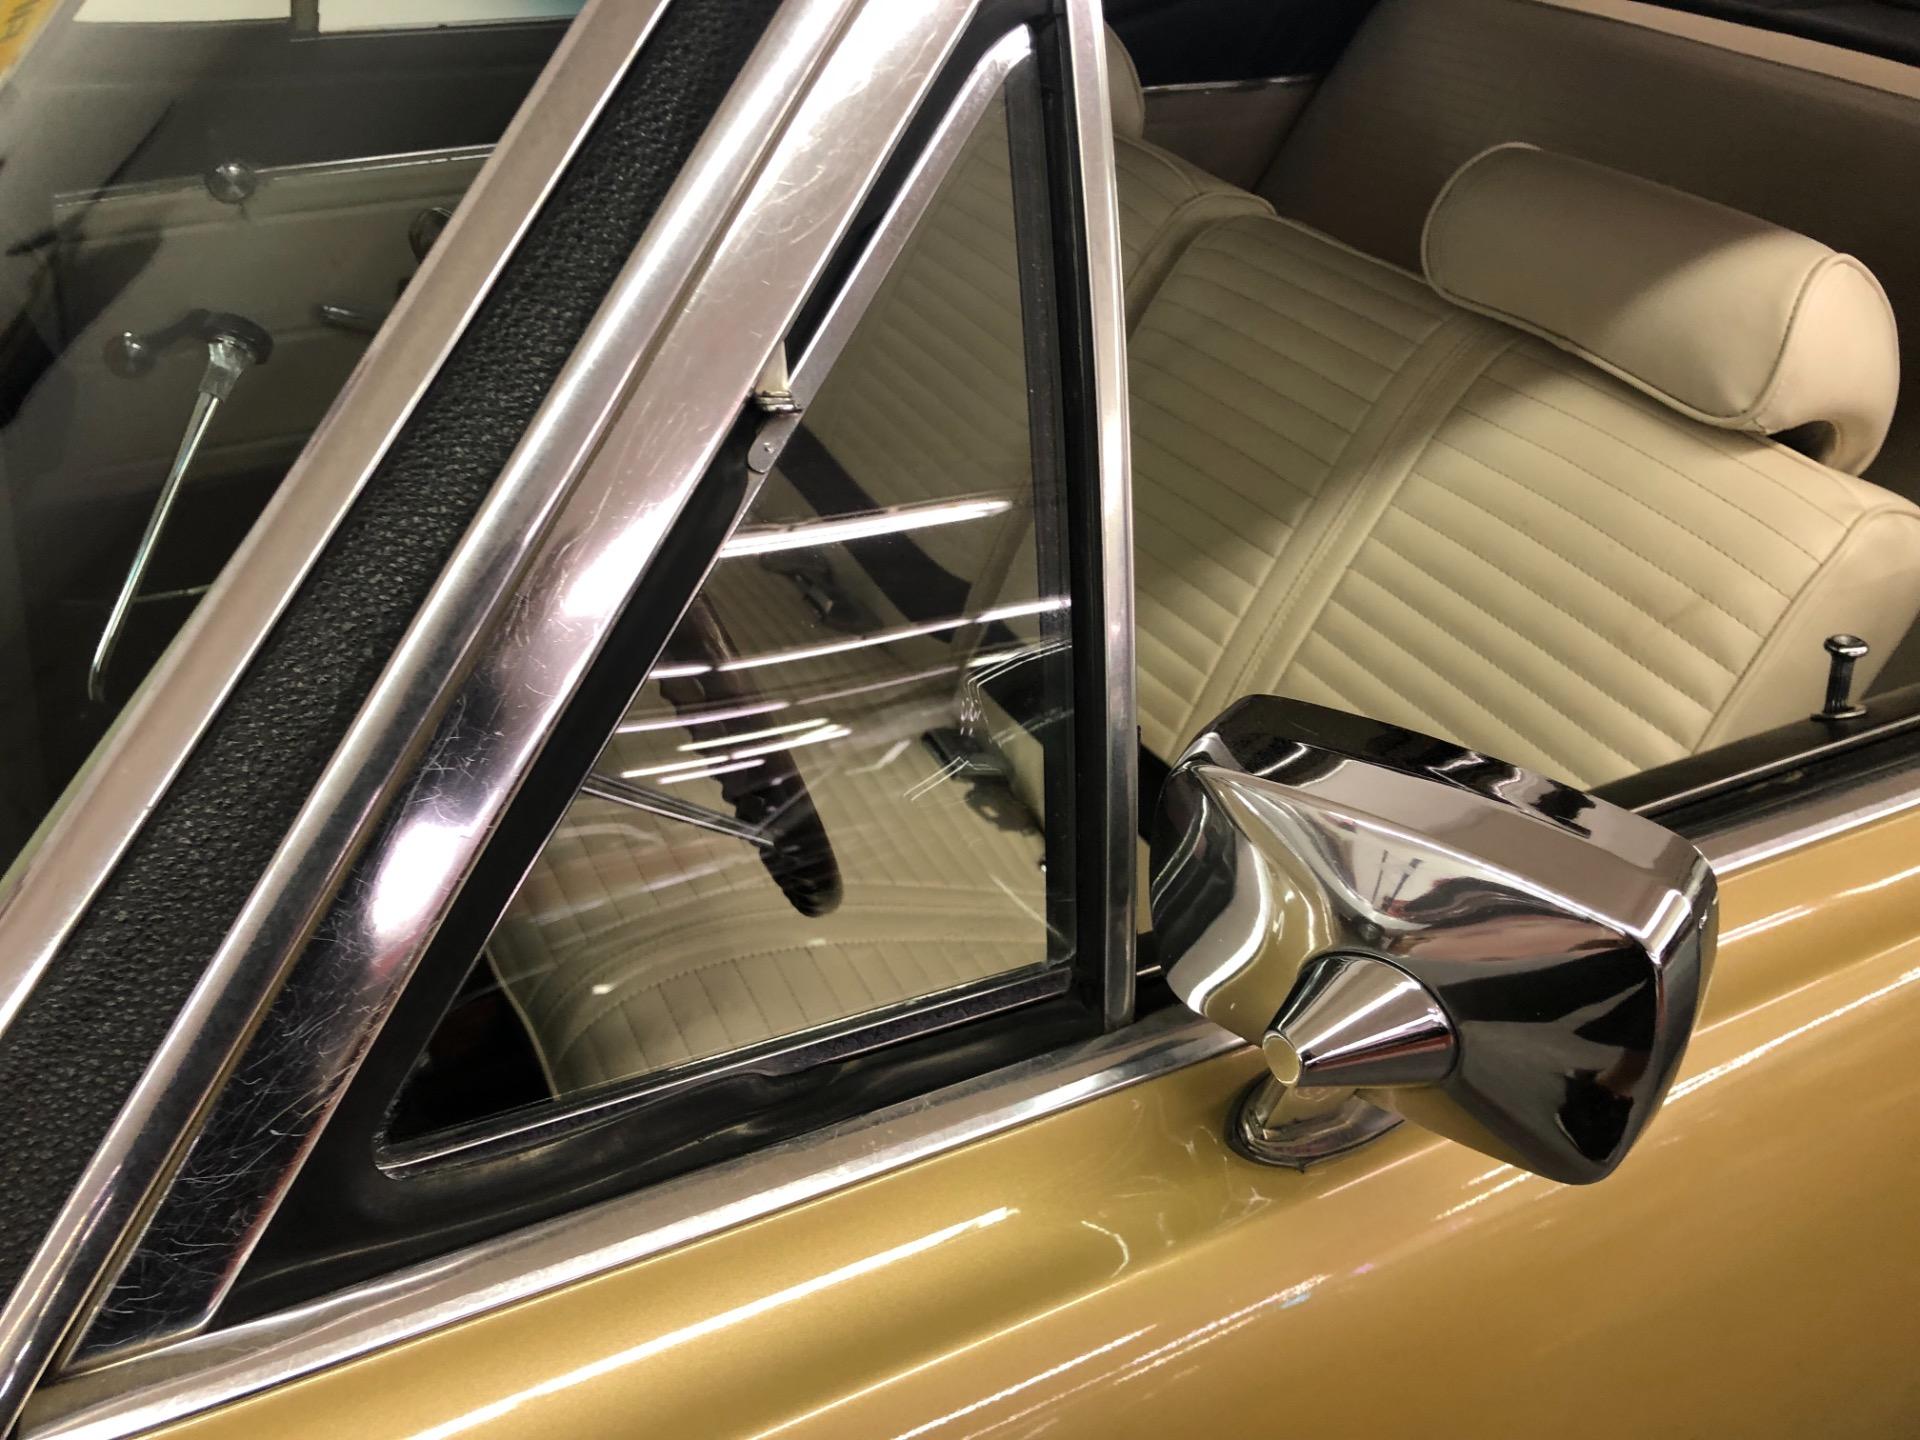 Used 1969 Buick Skylark -GRAN SPORT GS CALIFORNIA 350 RAM AIR- SEE VIDEO | Mundelein, IL